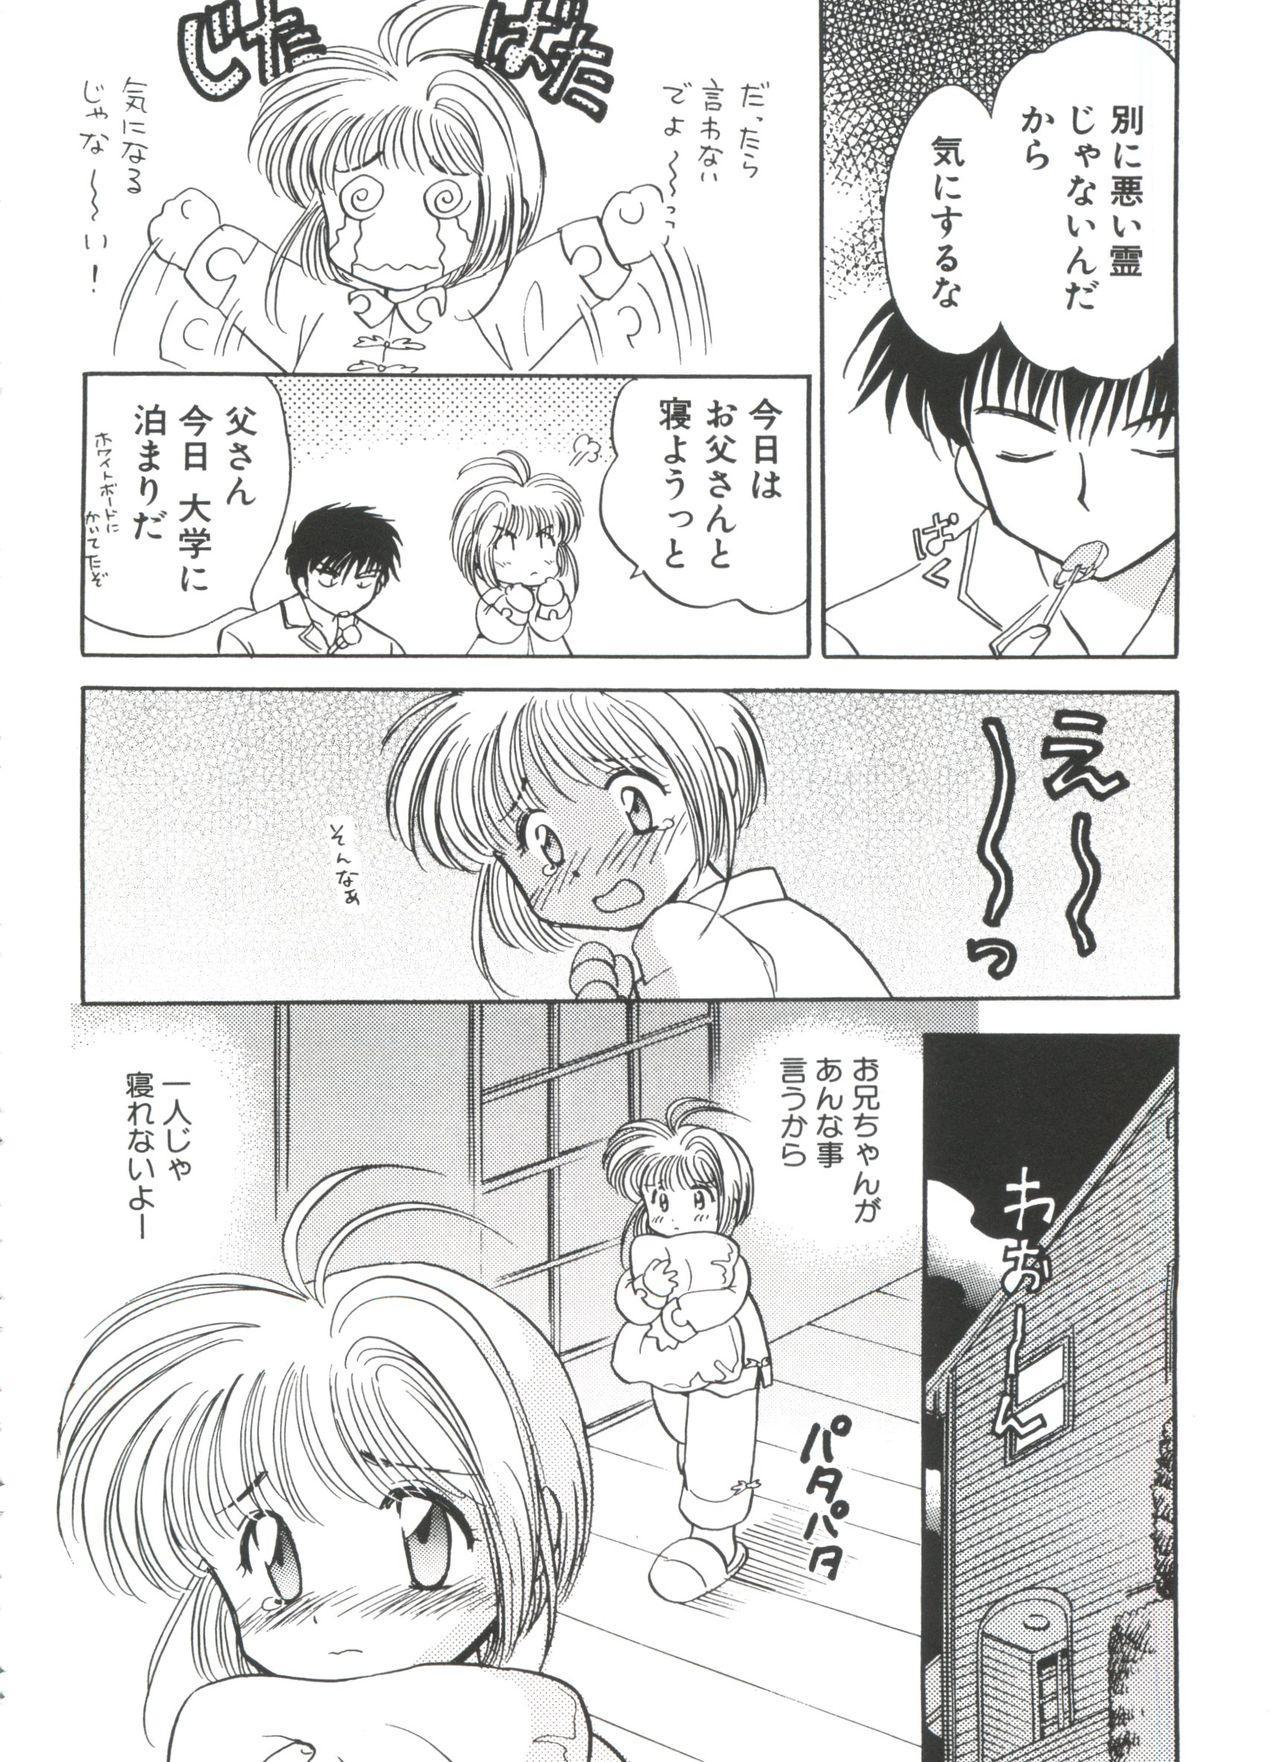 Ero-chan to Issho 2 23